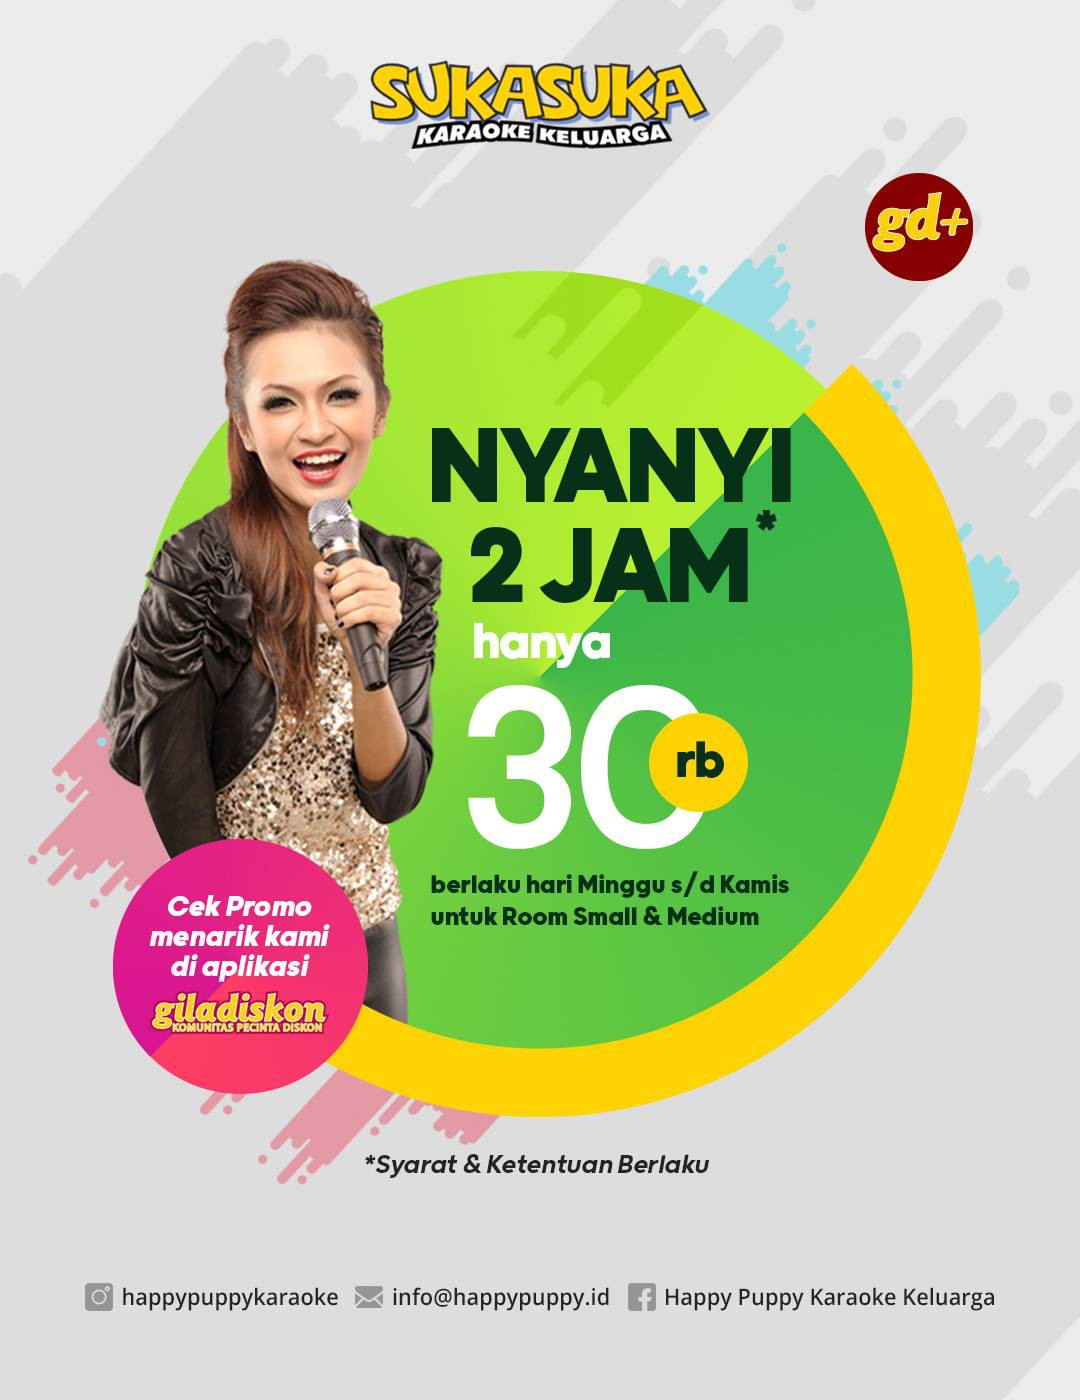 Promo Suka Suka Karaoke, Nyanyi 2 jam Hanya Rp 30.000